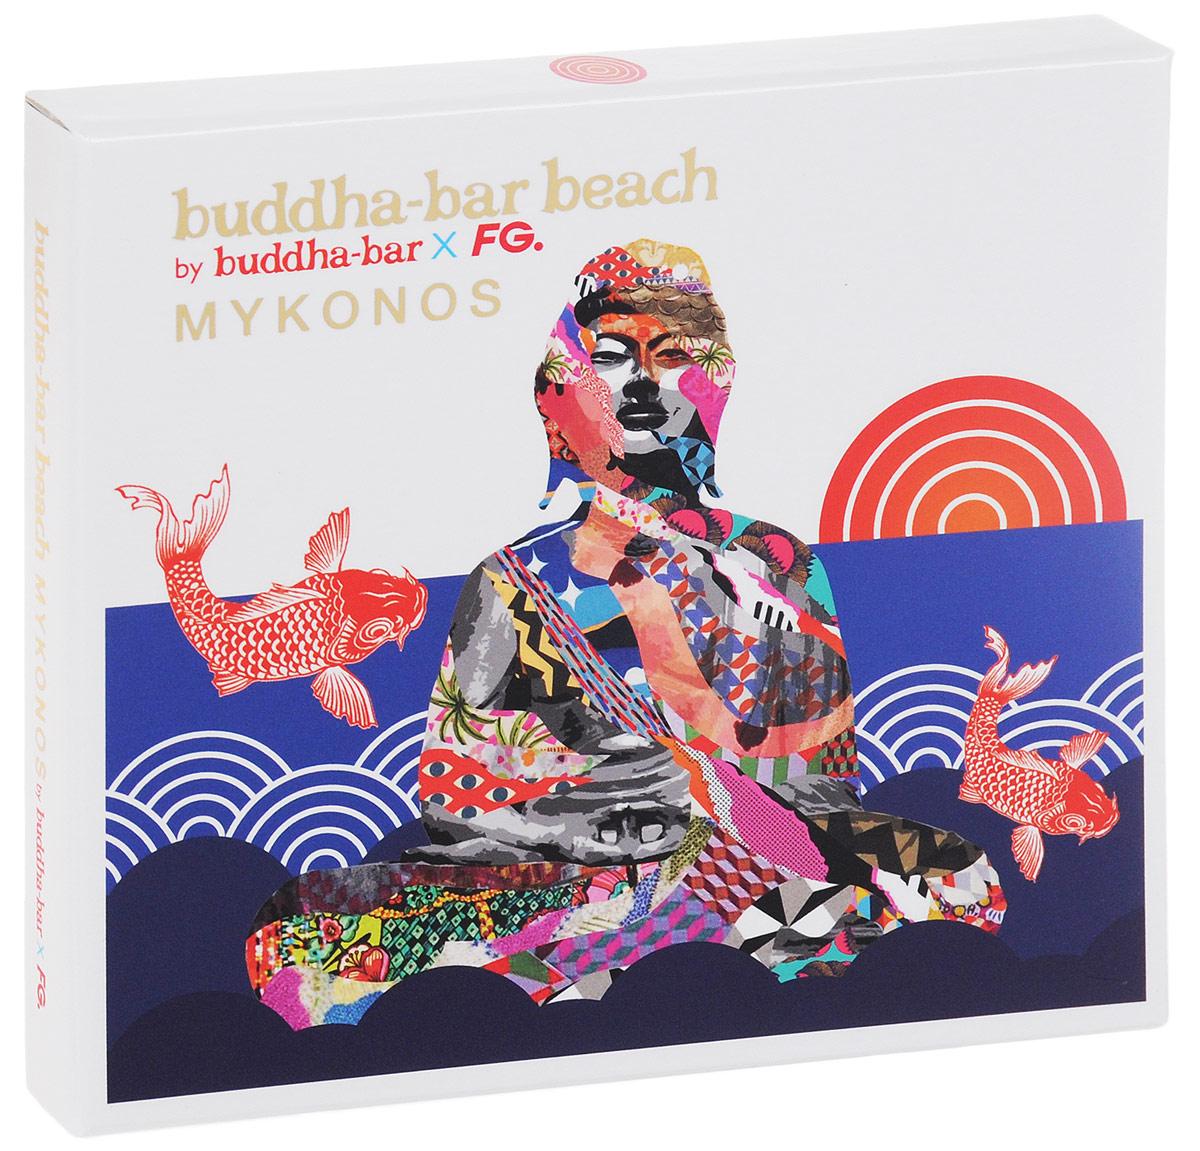 Buddha-Bar x FG. Buddha-Bar Beach. Mykonos 2015 Audio CD